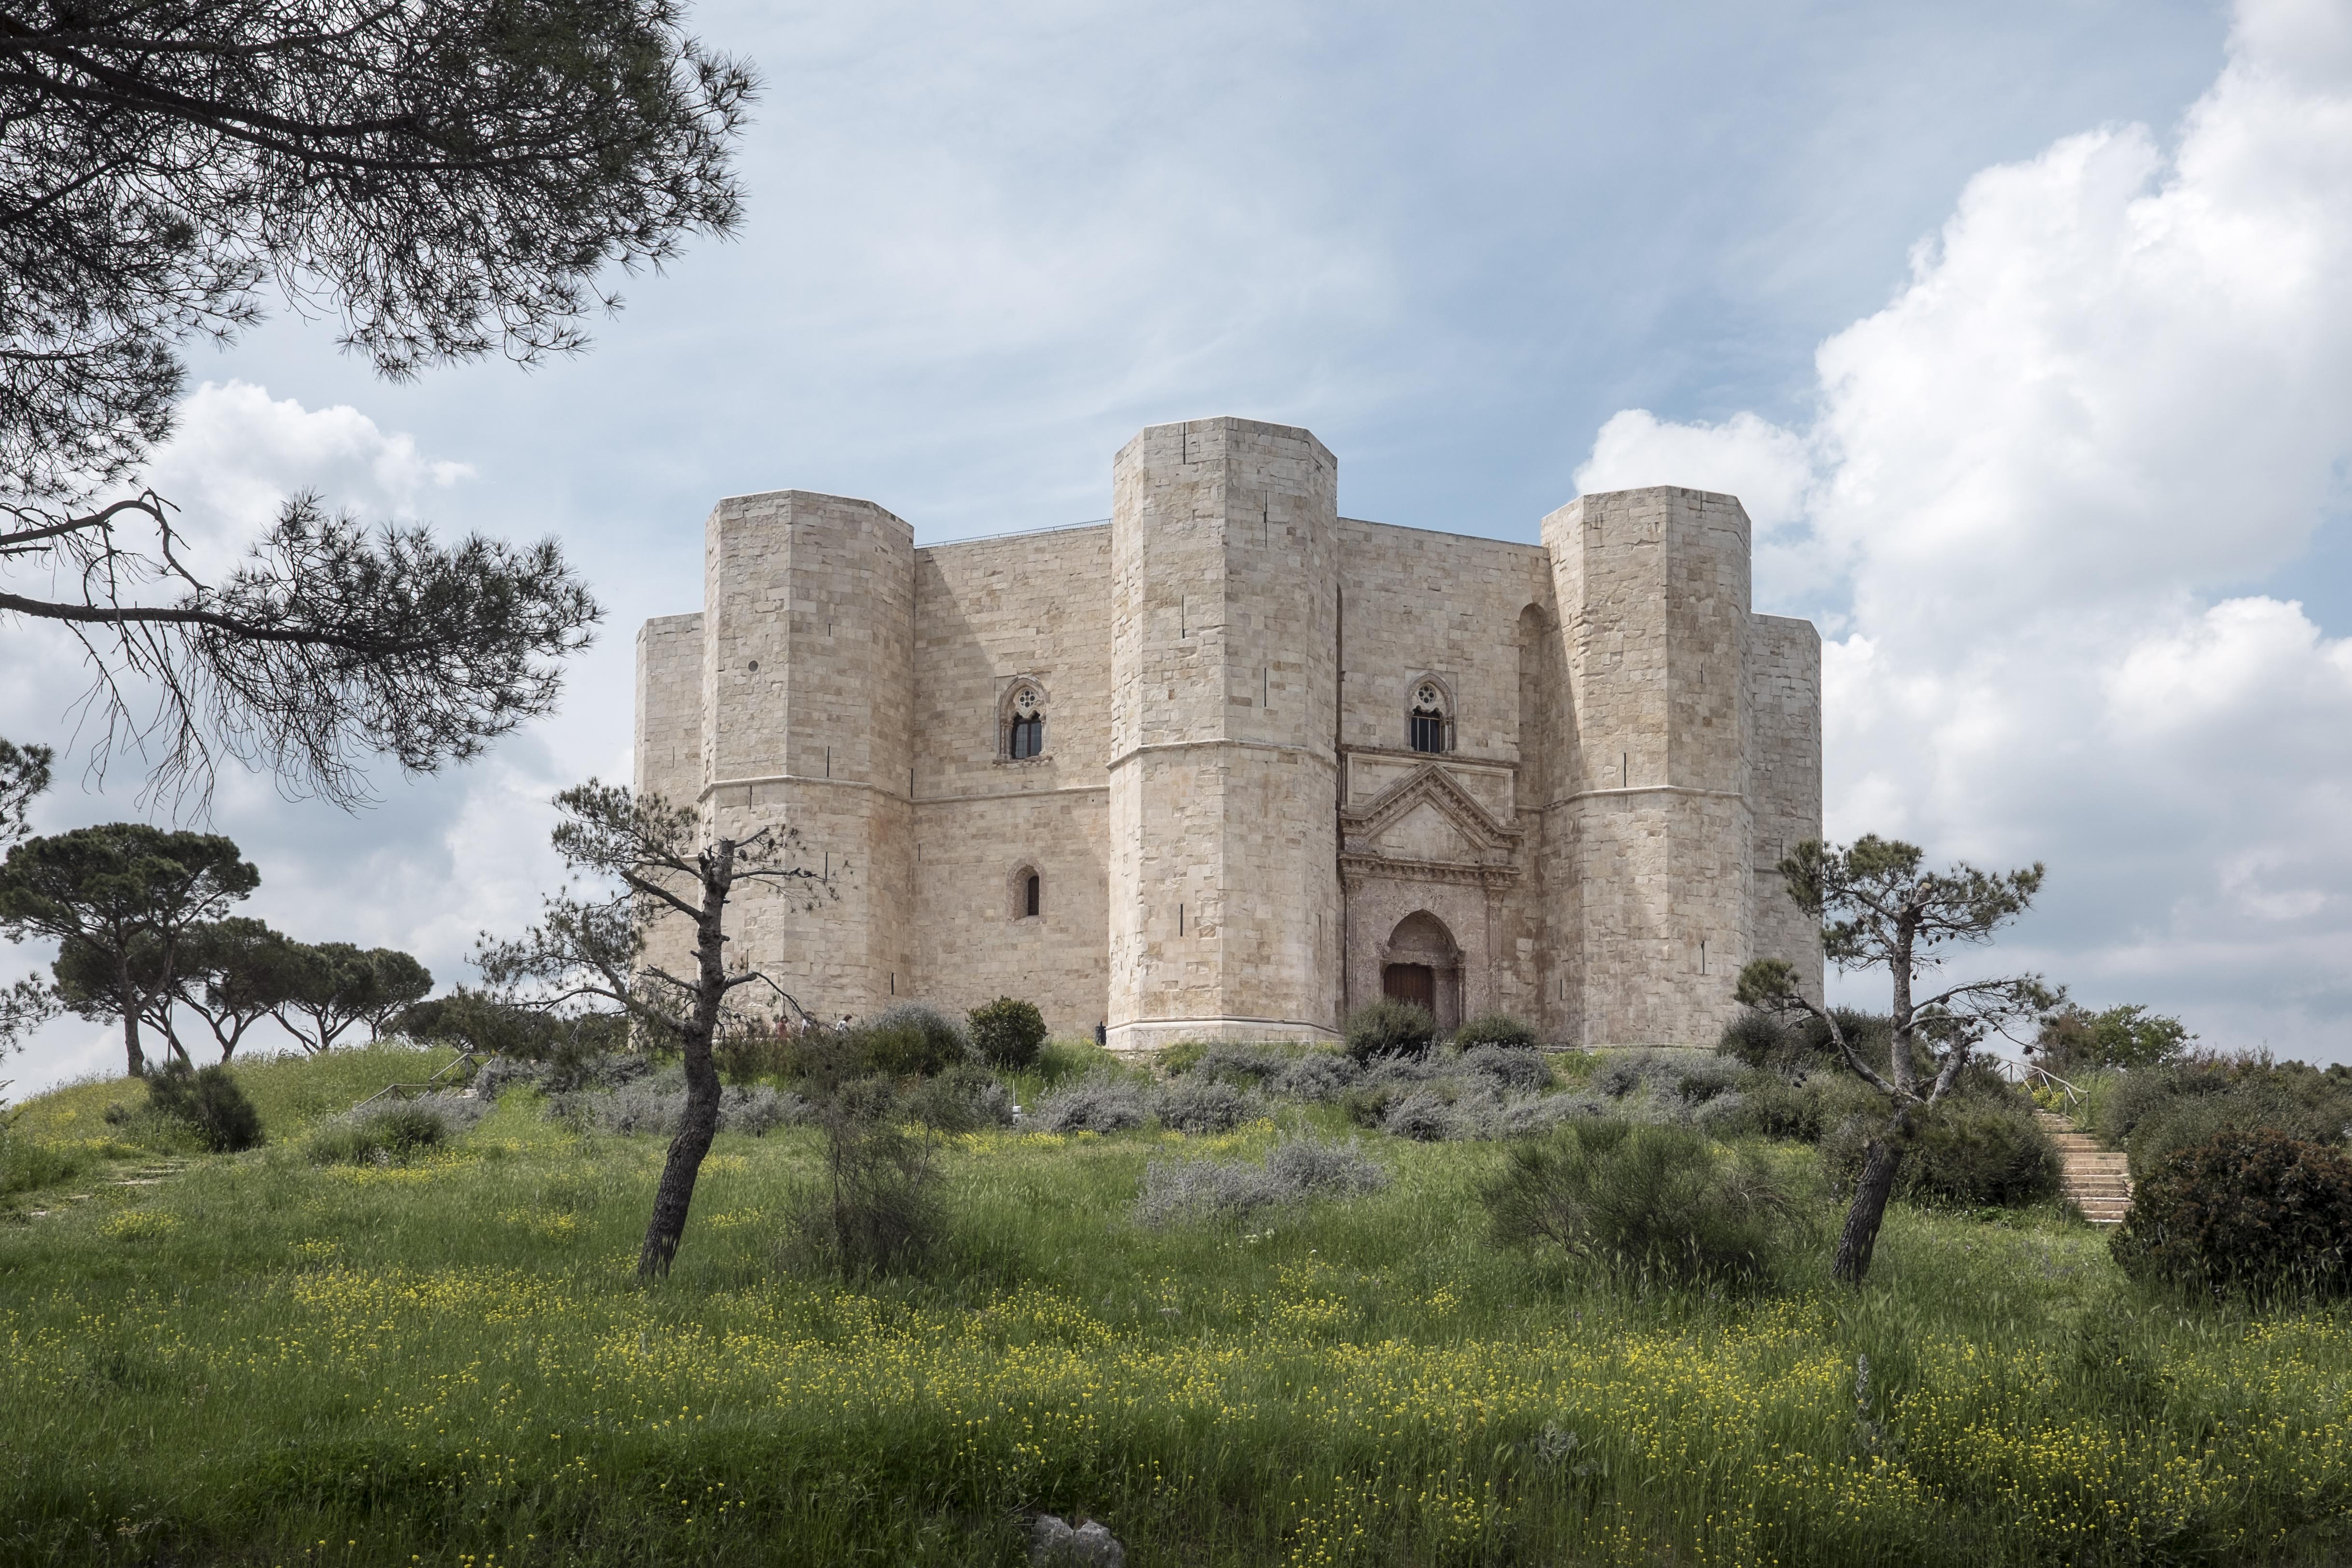 castel del monte - photo #13